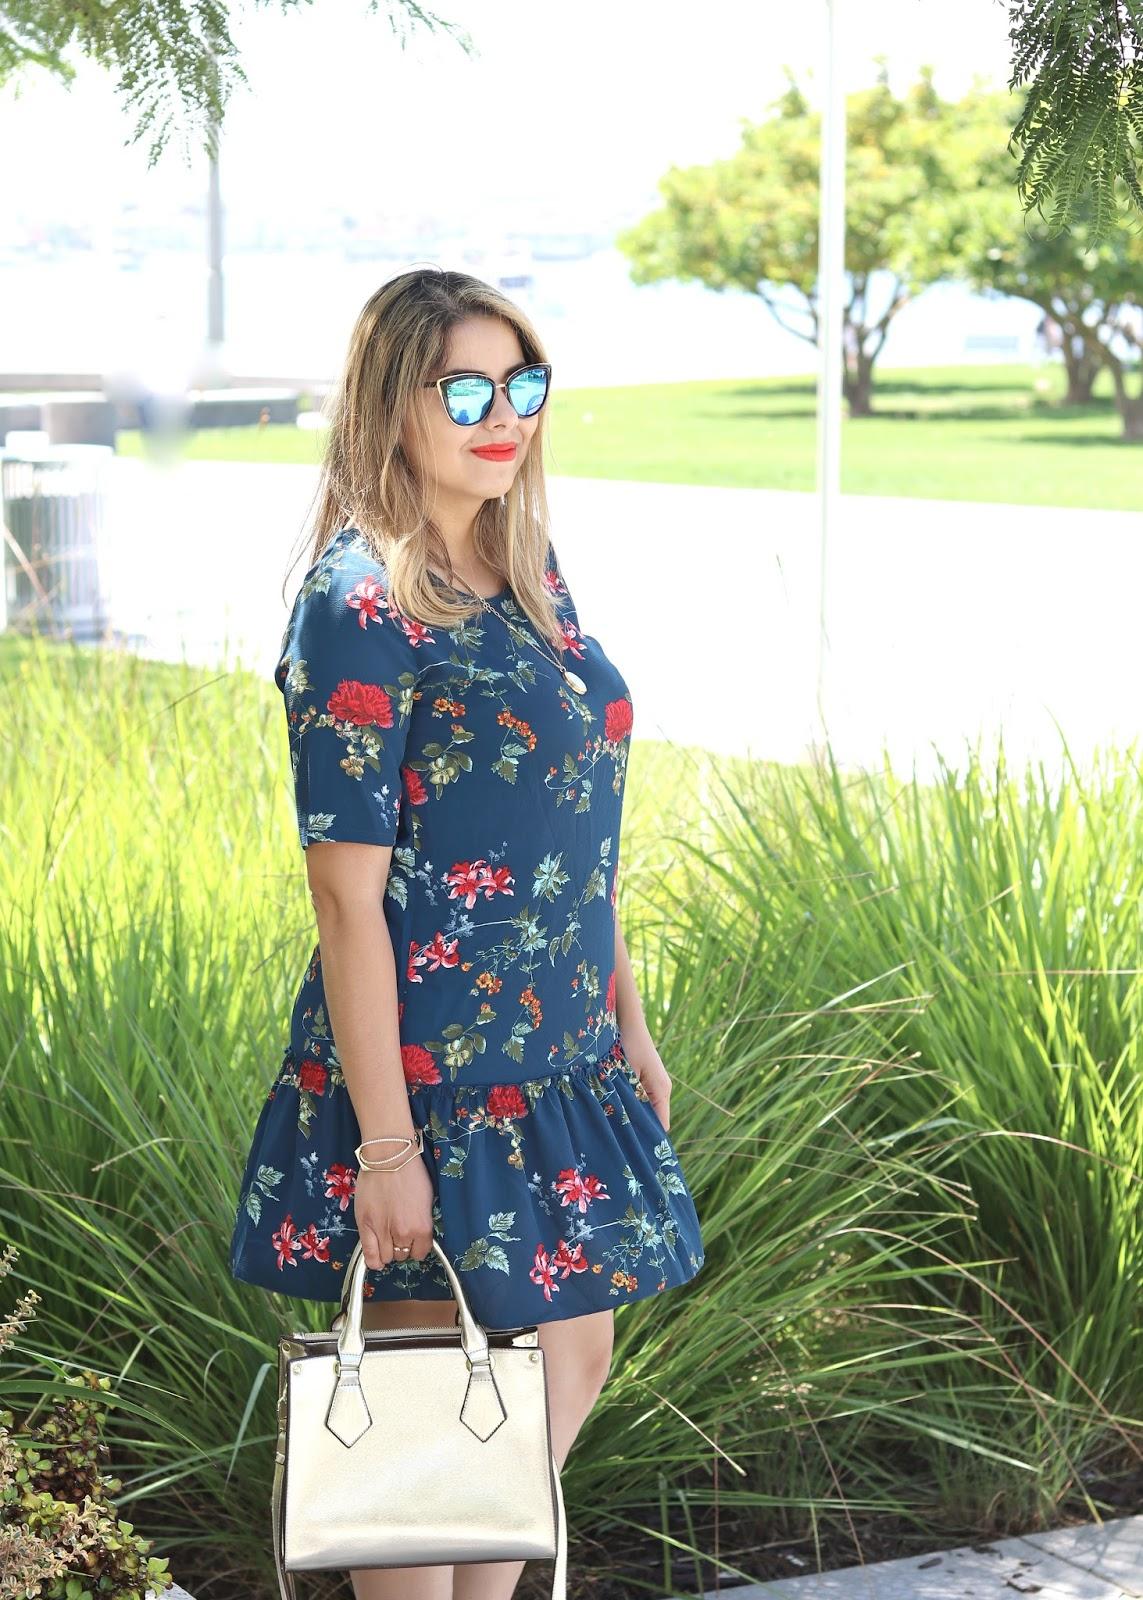 galian handbag blogger, quay sunglasses, gold structured purse, target style dress, dress under $25, affordable fashion blogger